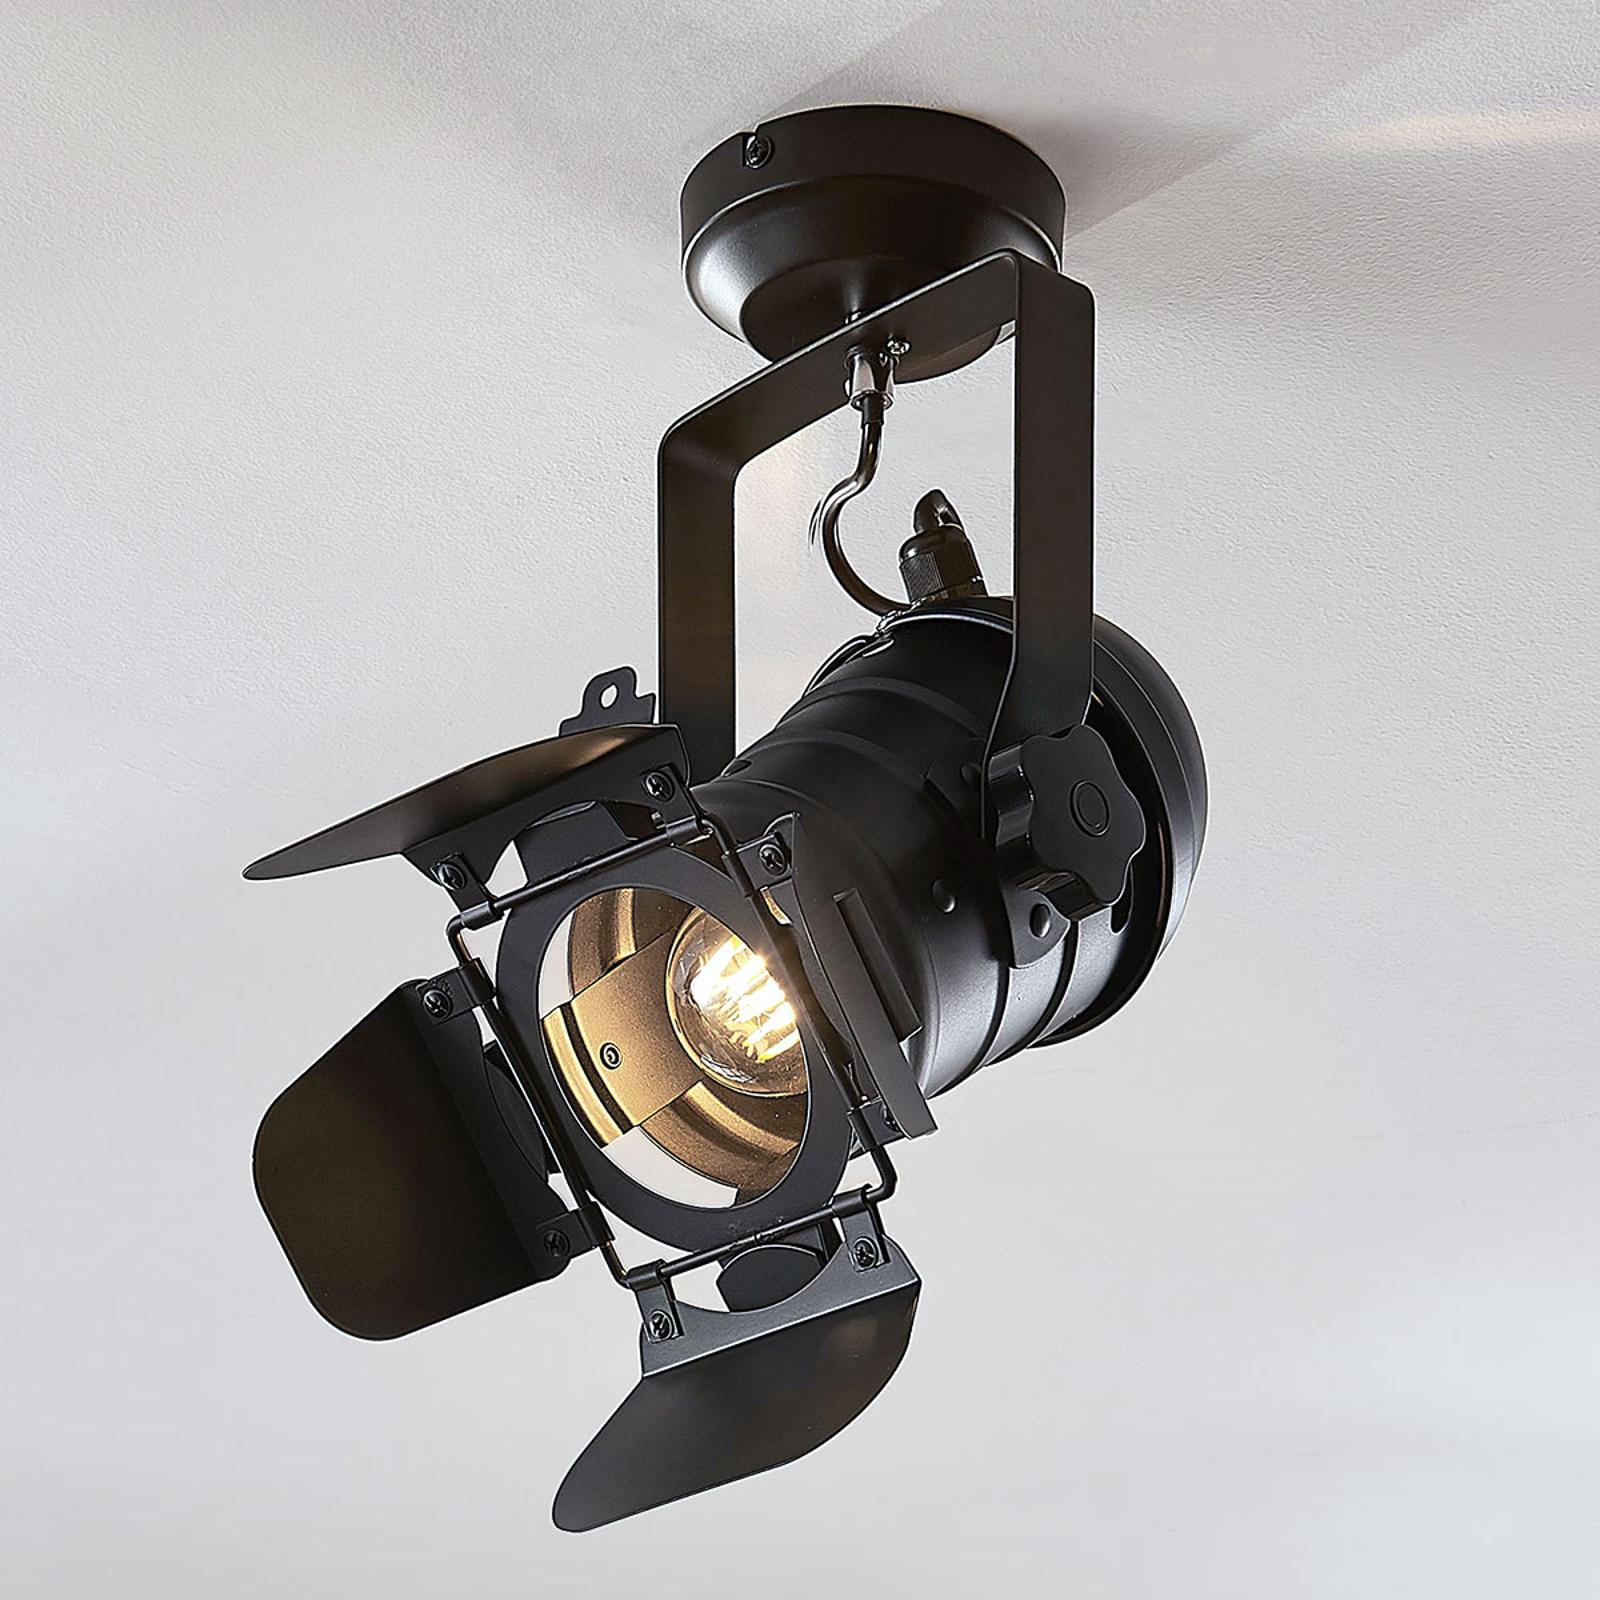 Plafondlamp Tilen, met één lampje in koplamp-look